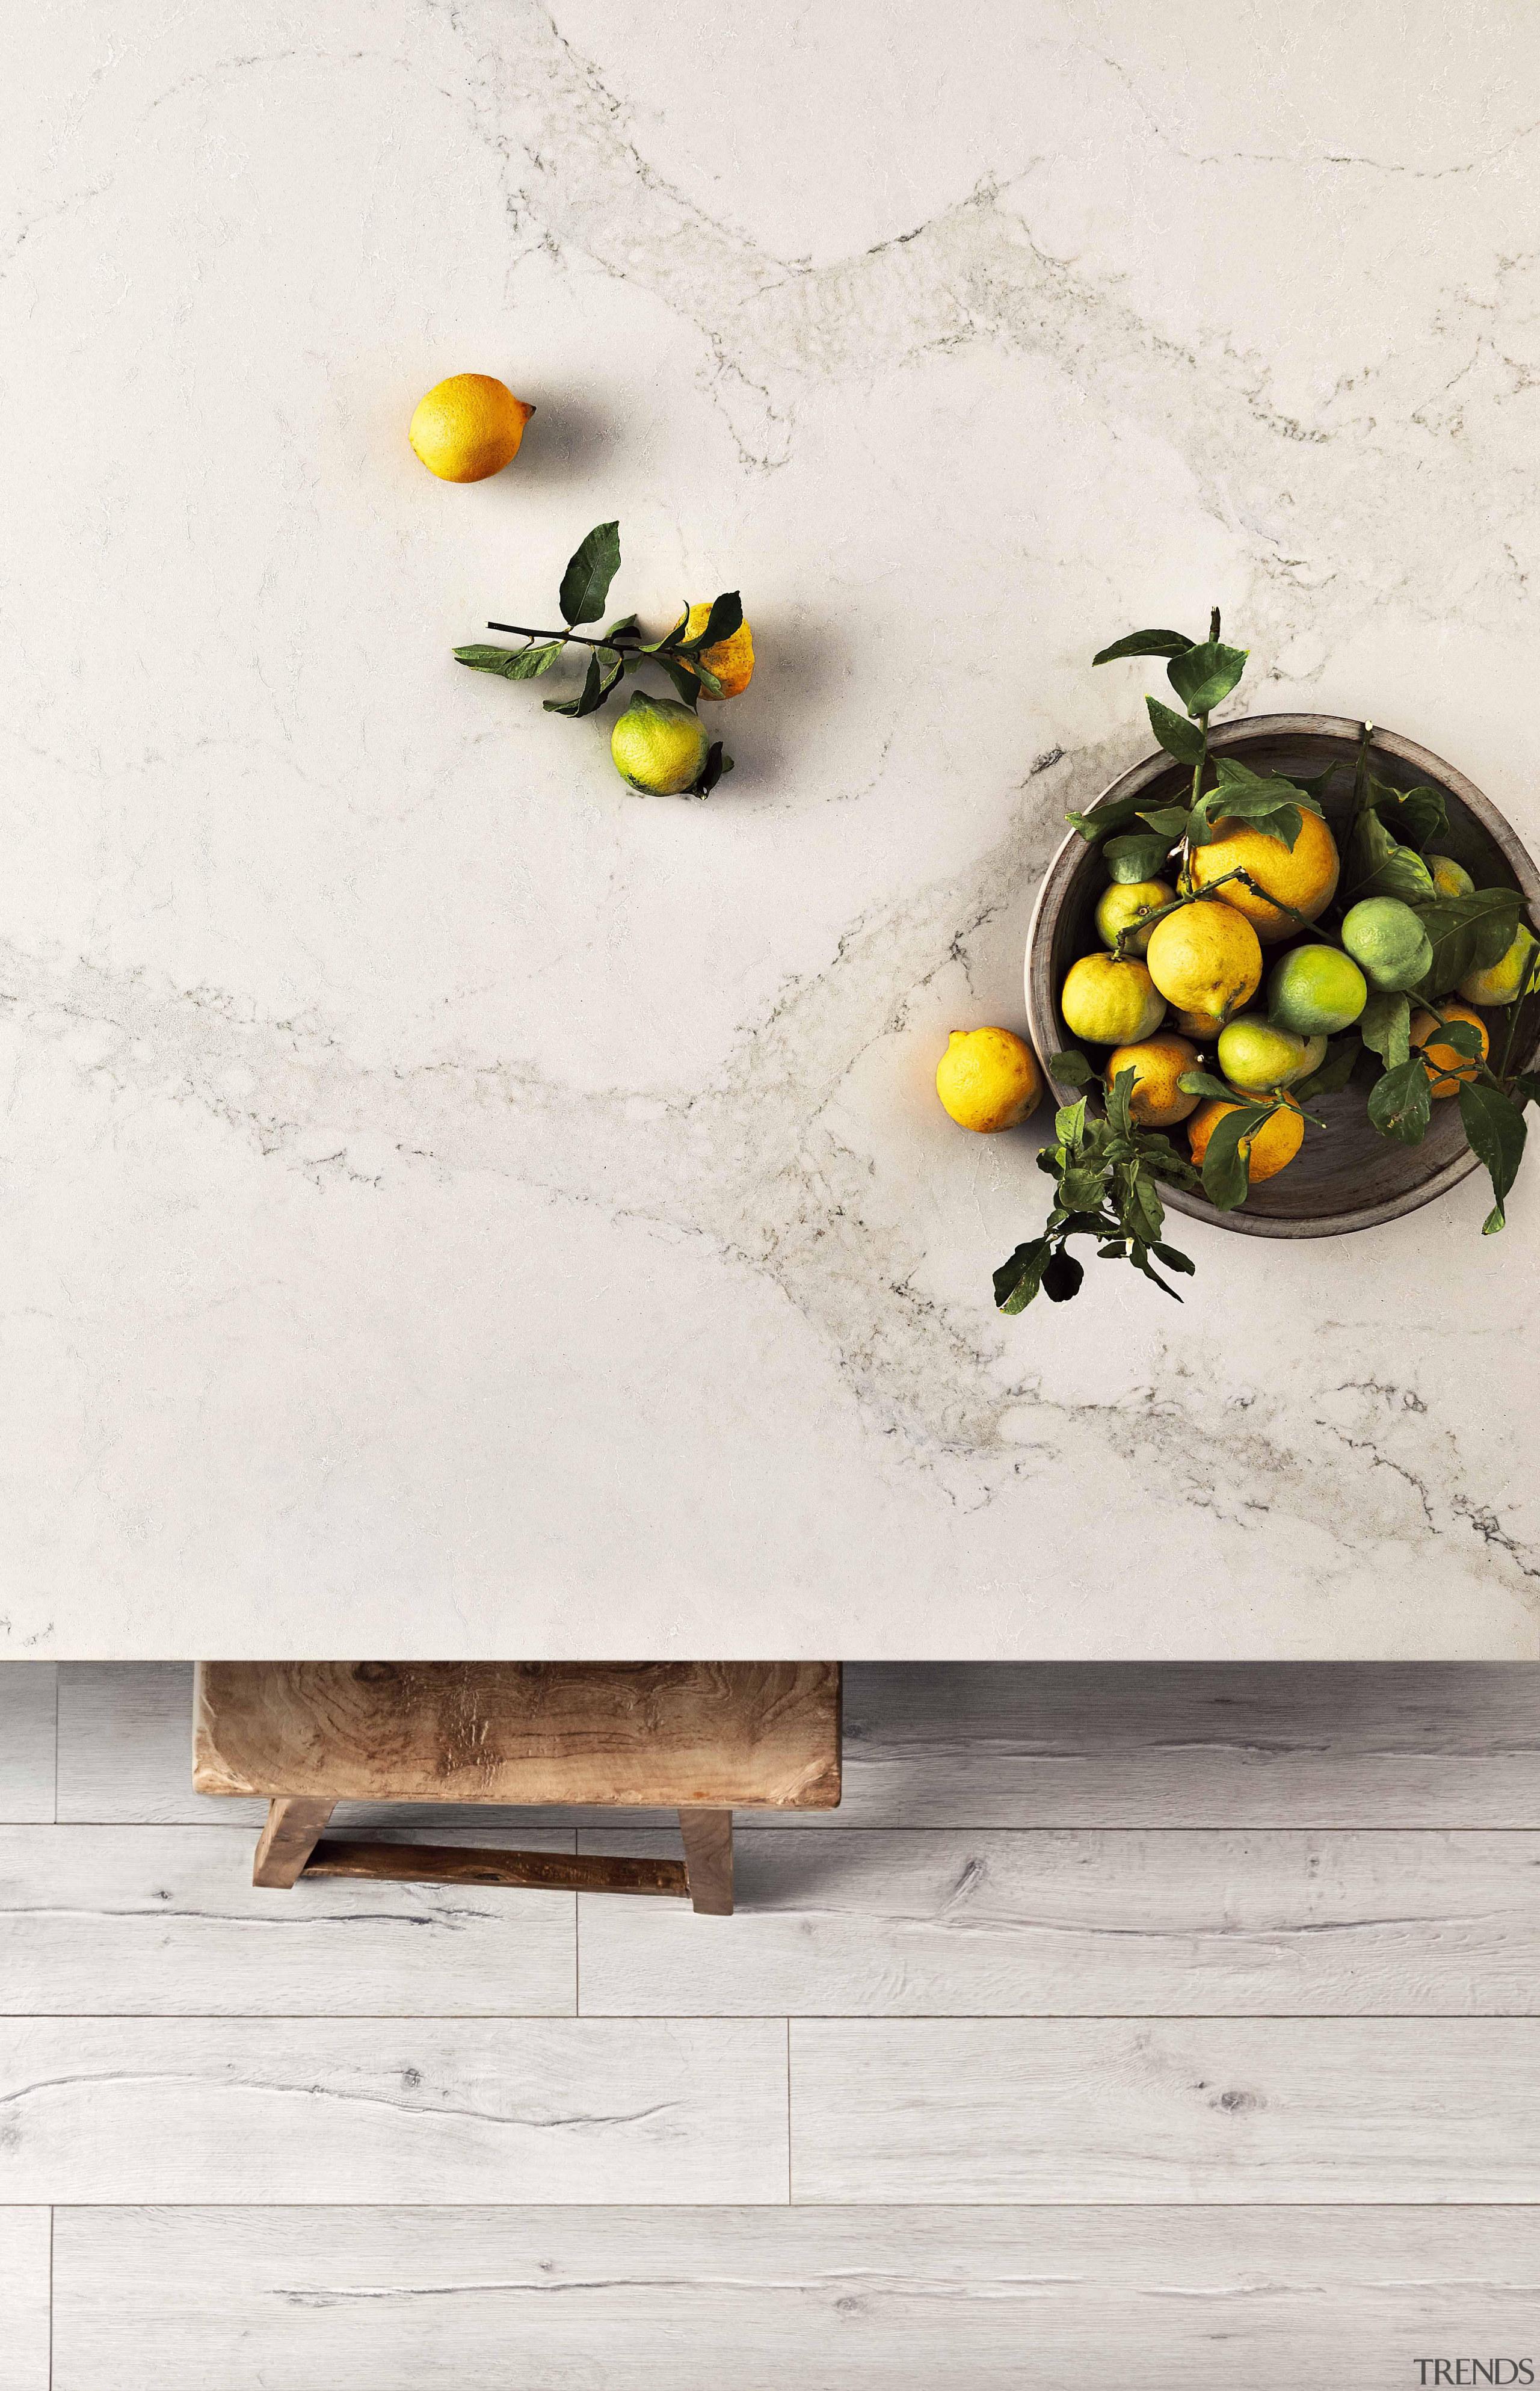 As Caesarstone's interpretation of natural Calacatta marble, Calacatta fruit, produce, still life photography, table, yellow, white